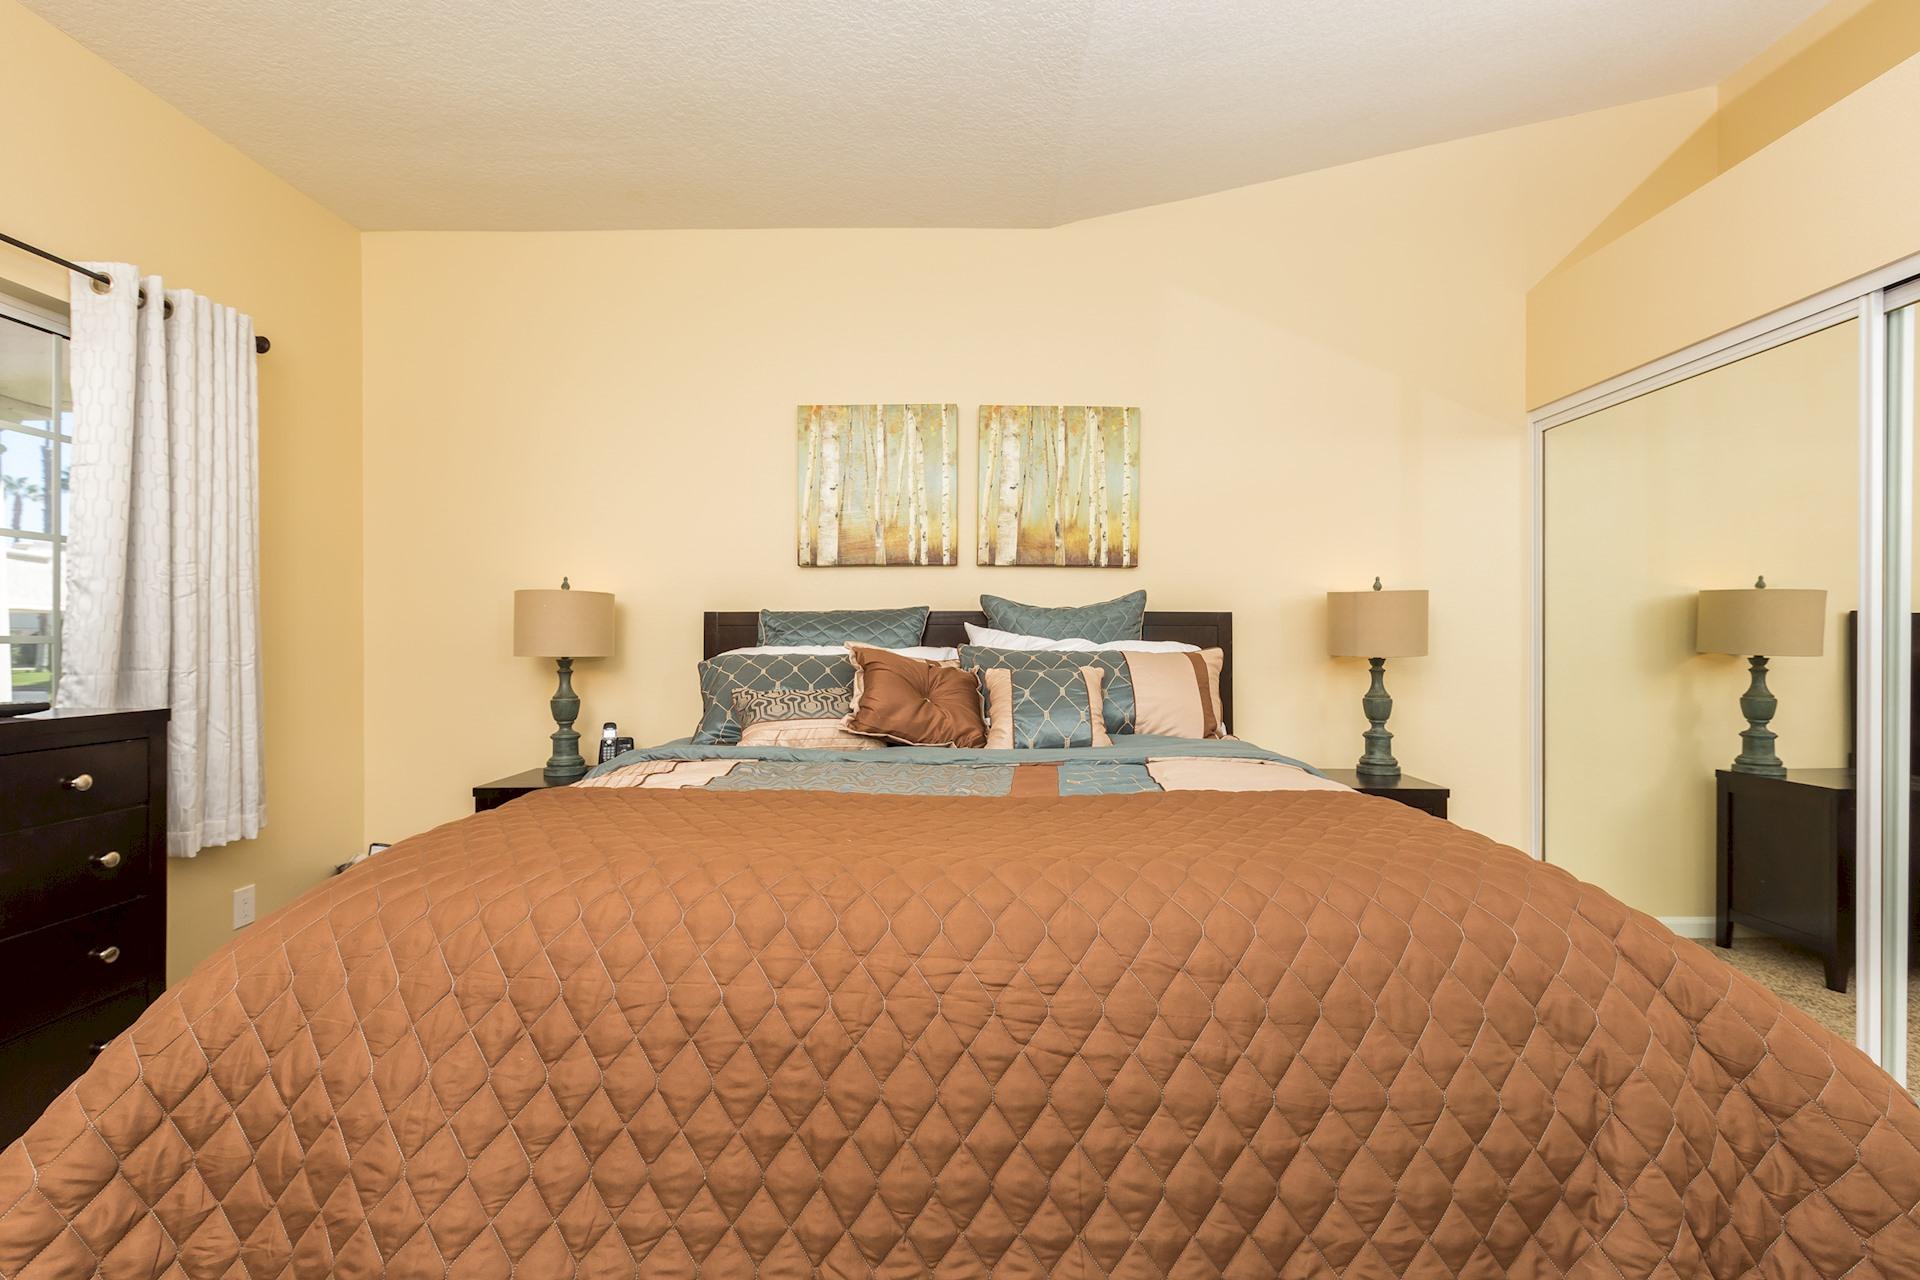 Apartment PALM DESERT LUXURY VIP HOME w POOL DESERT PARADISE photo 20215268